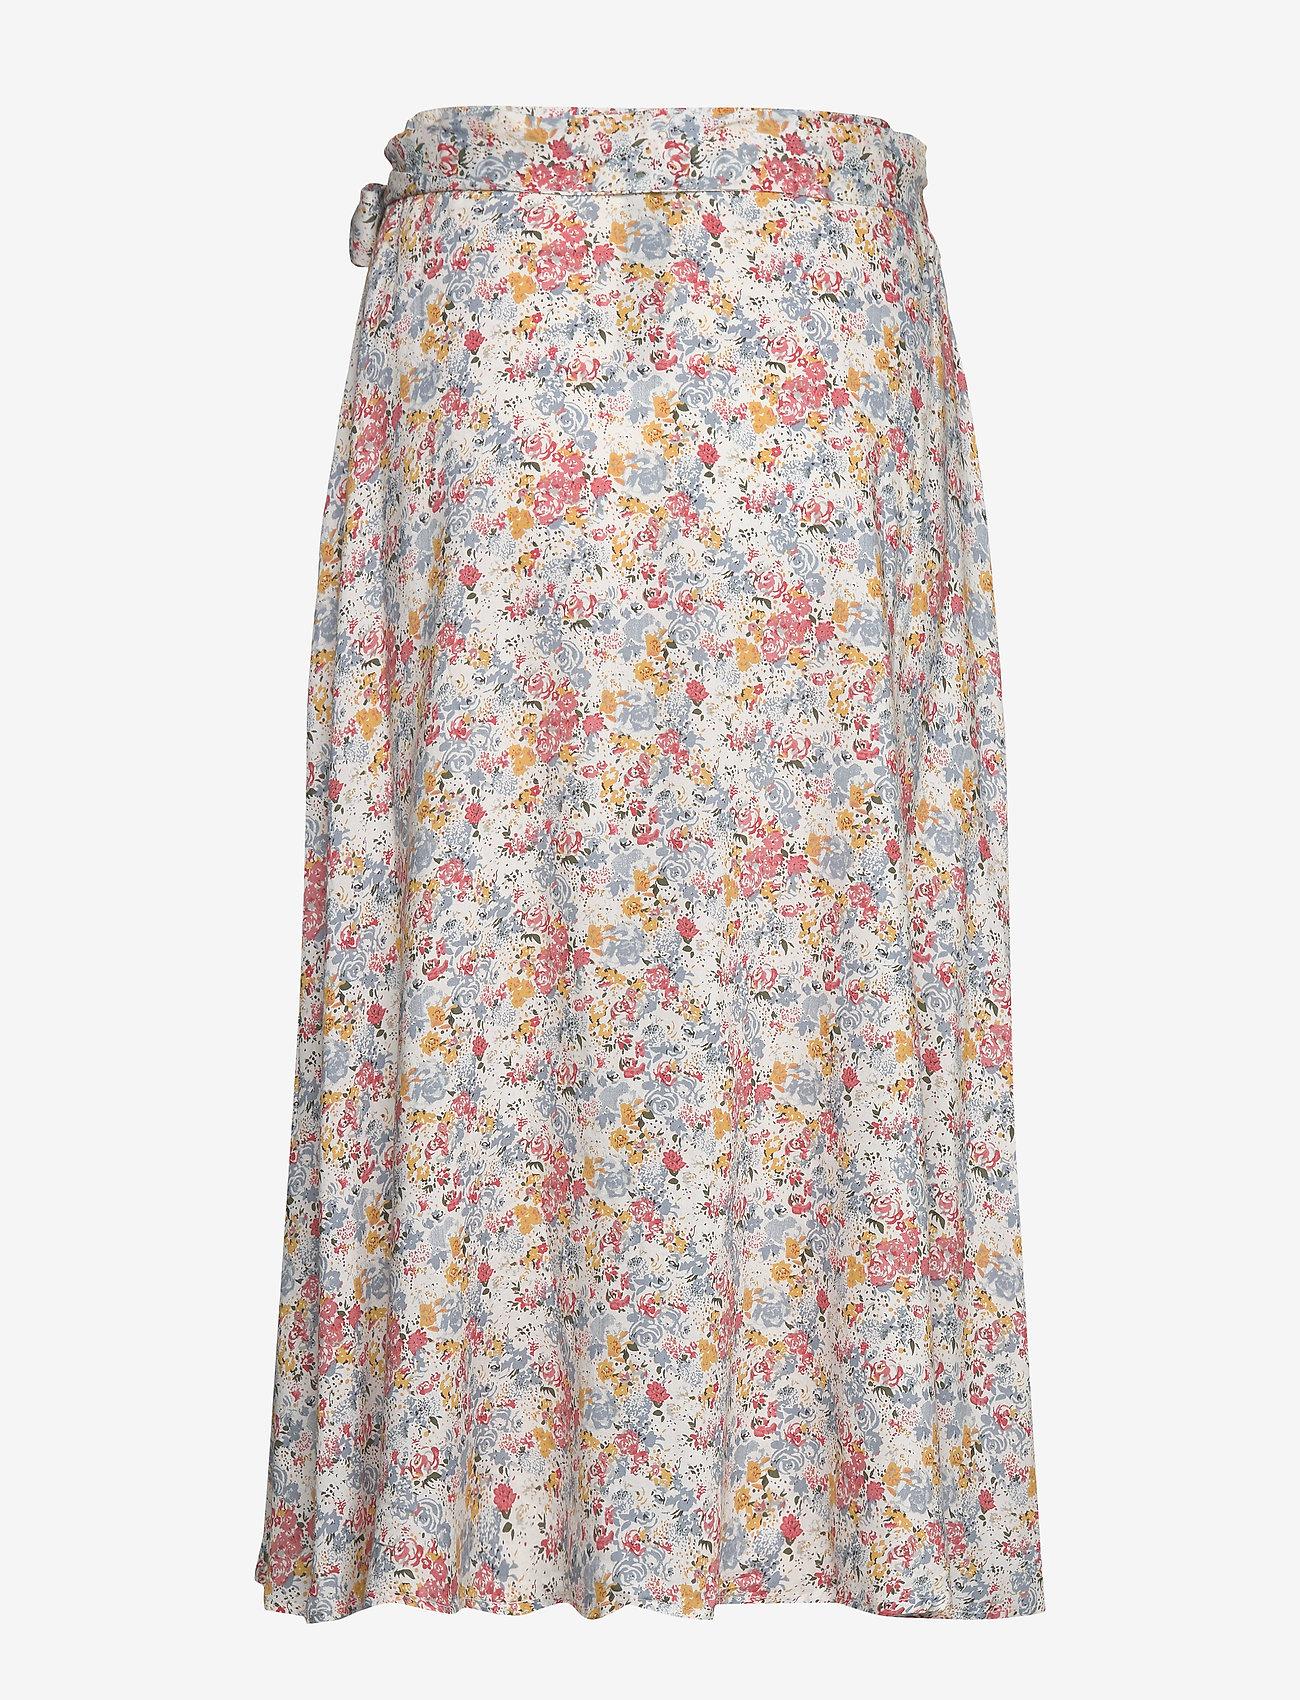 Rose Wrap Skirt (Meadow Print) (104.30 €) - Lexington Clothing LMUU0